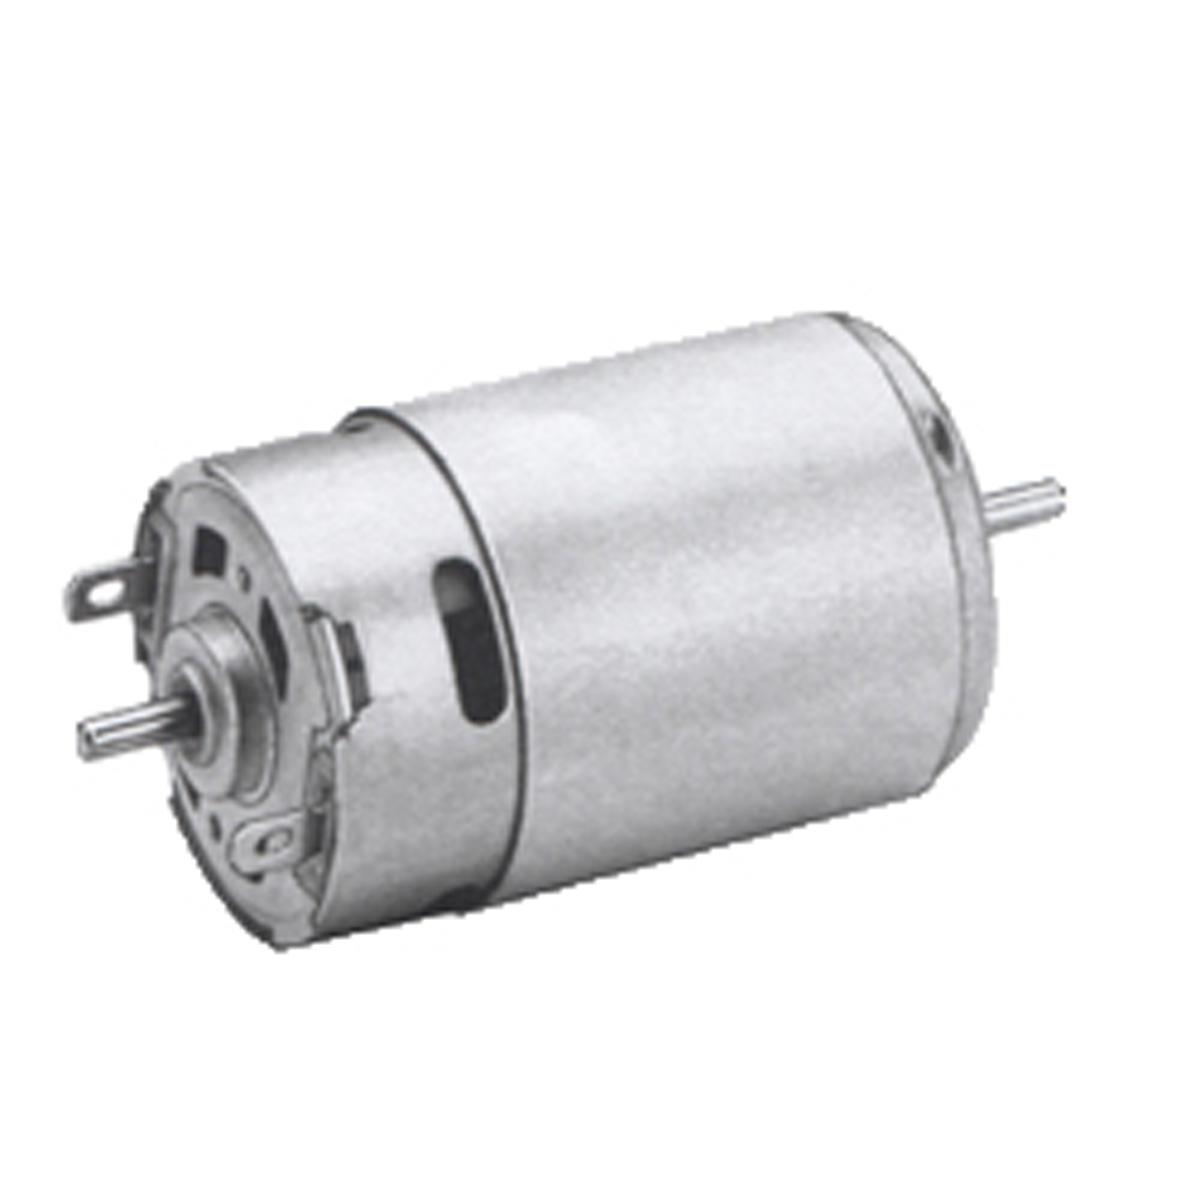 12 Volt Reversible Motor